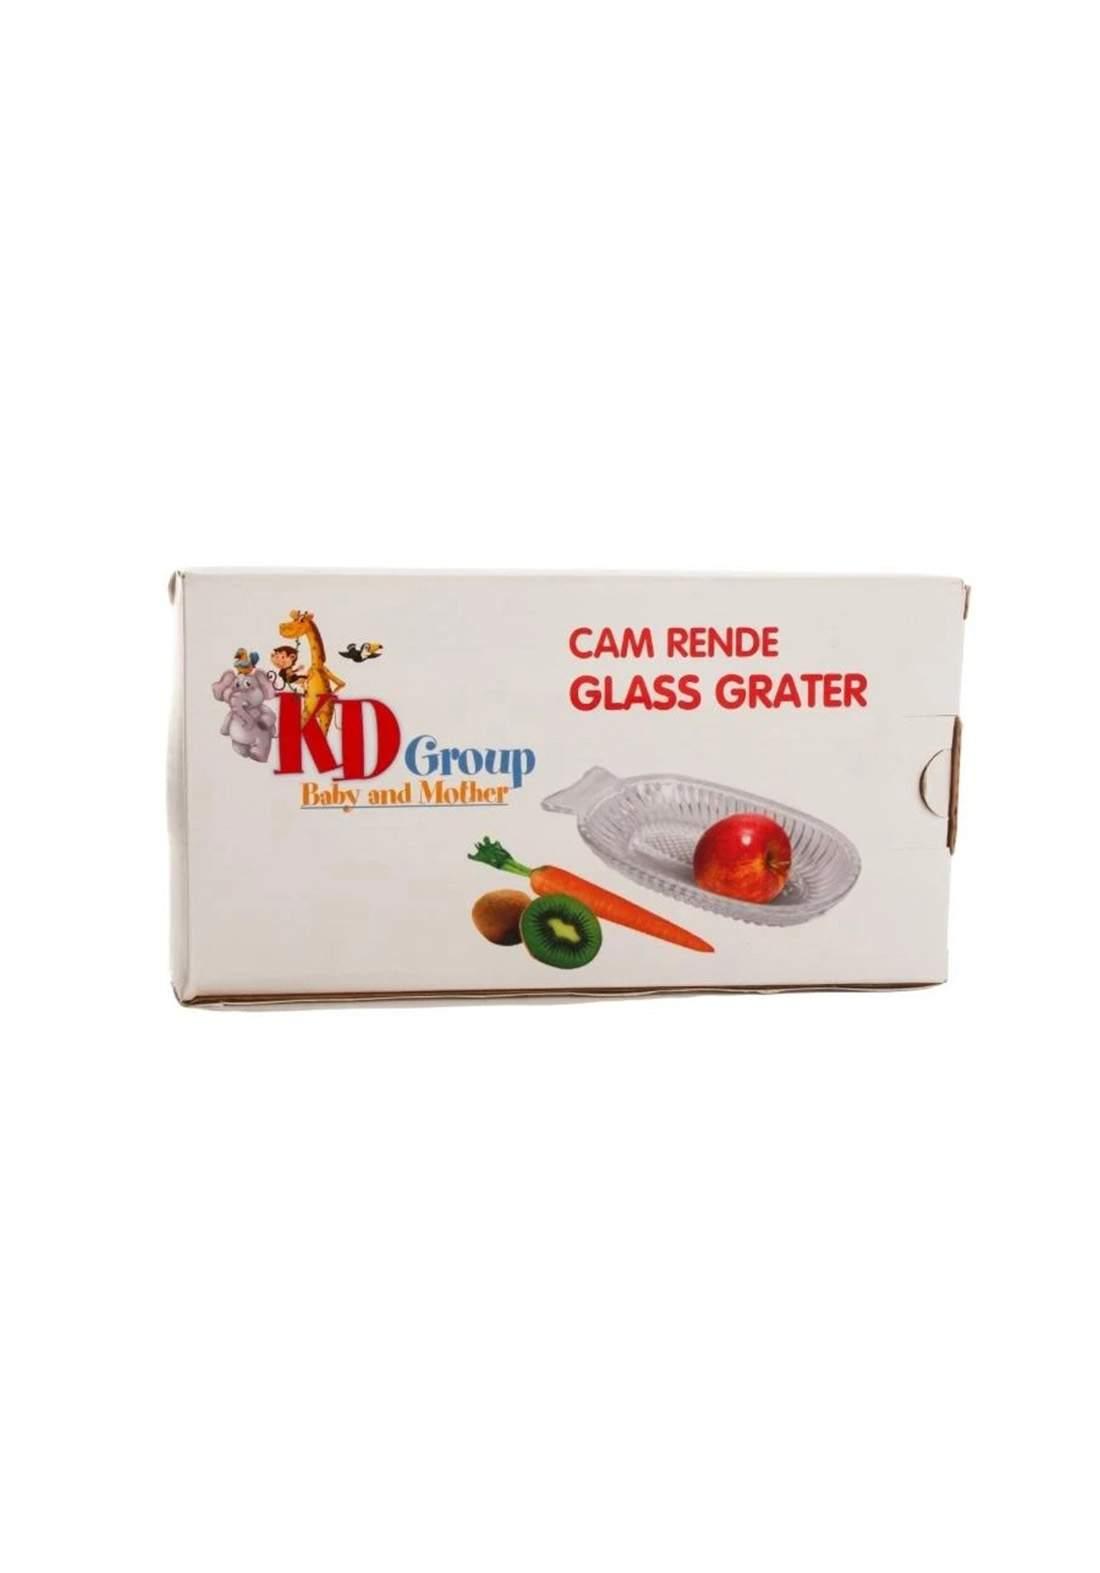 KD Group Glass Grater  مبشرة زجاجية للاطفال